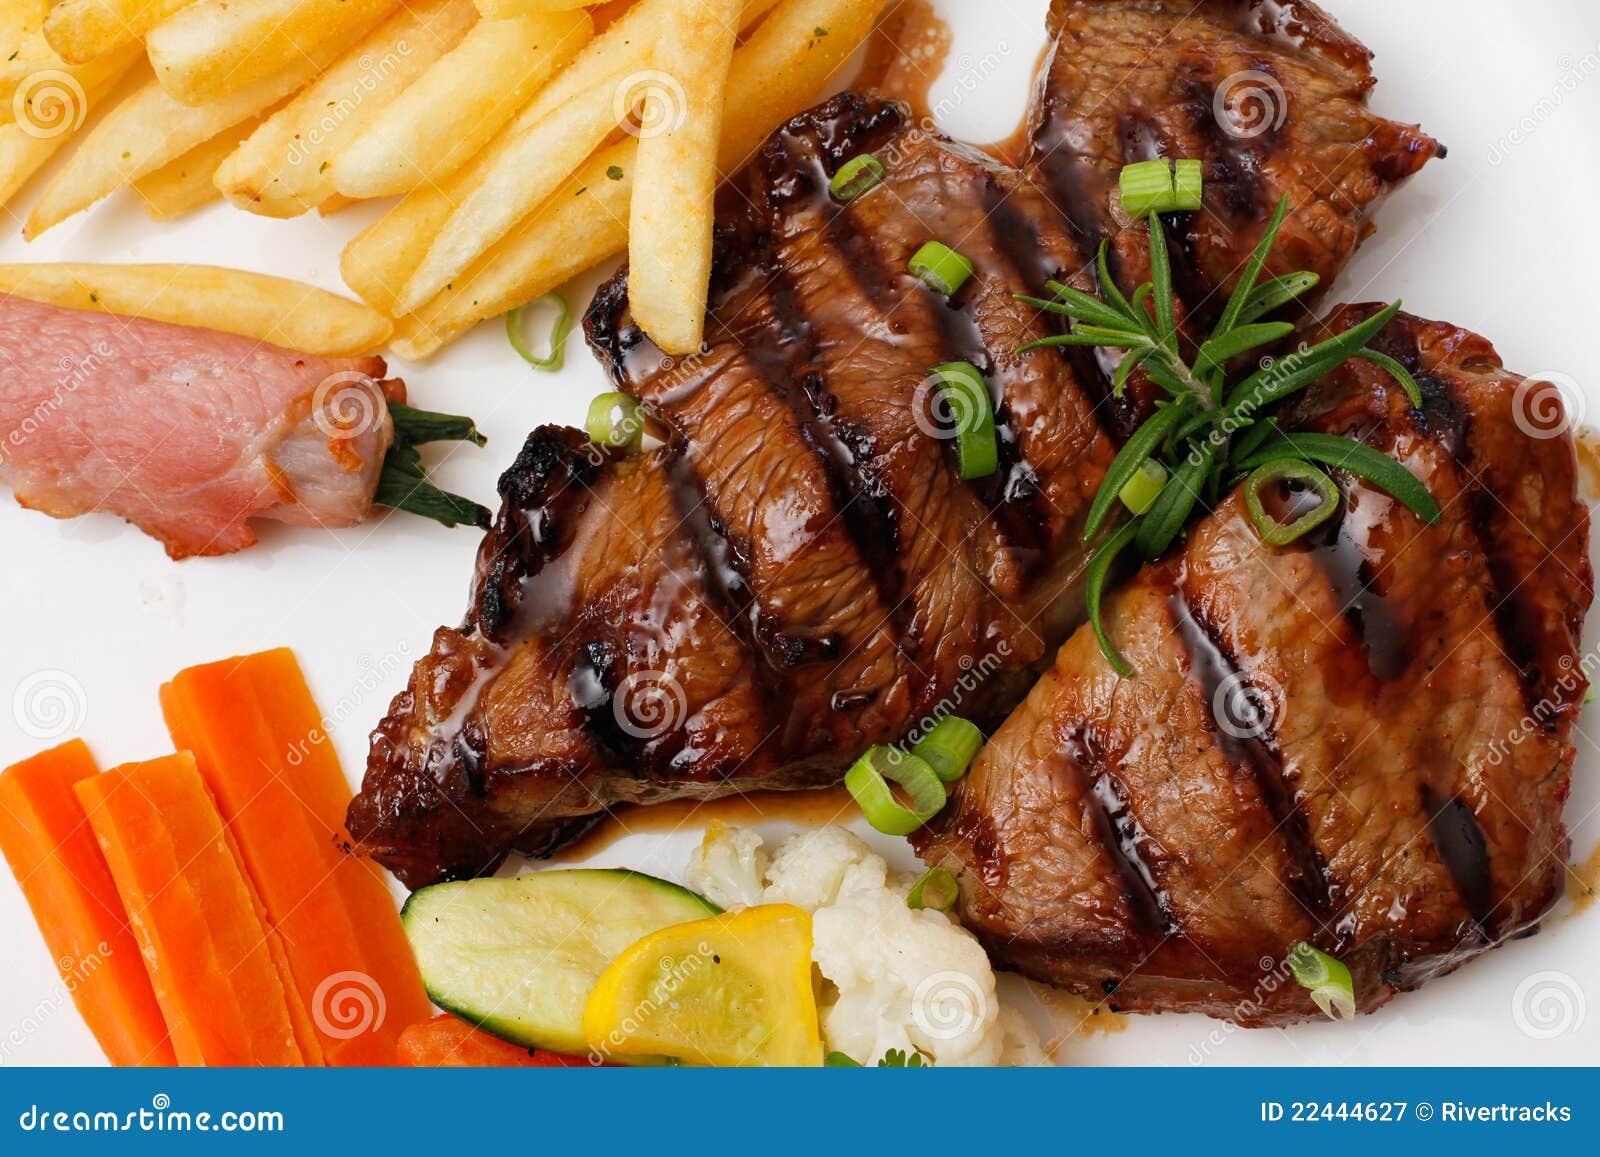 Garnished Plate Of Grilled Steak Meat Stock Image - Image ...